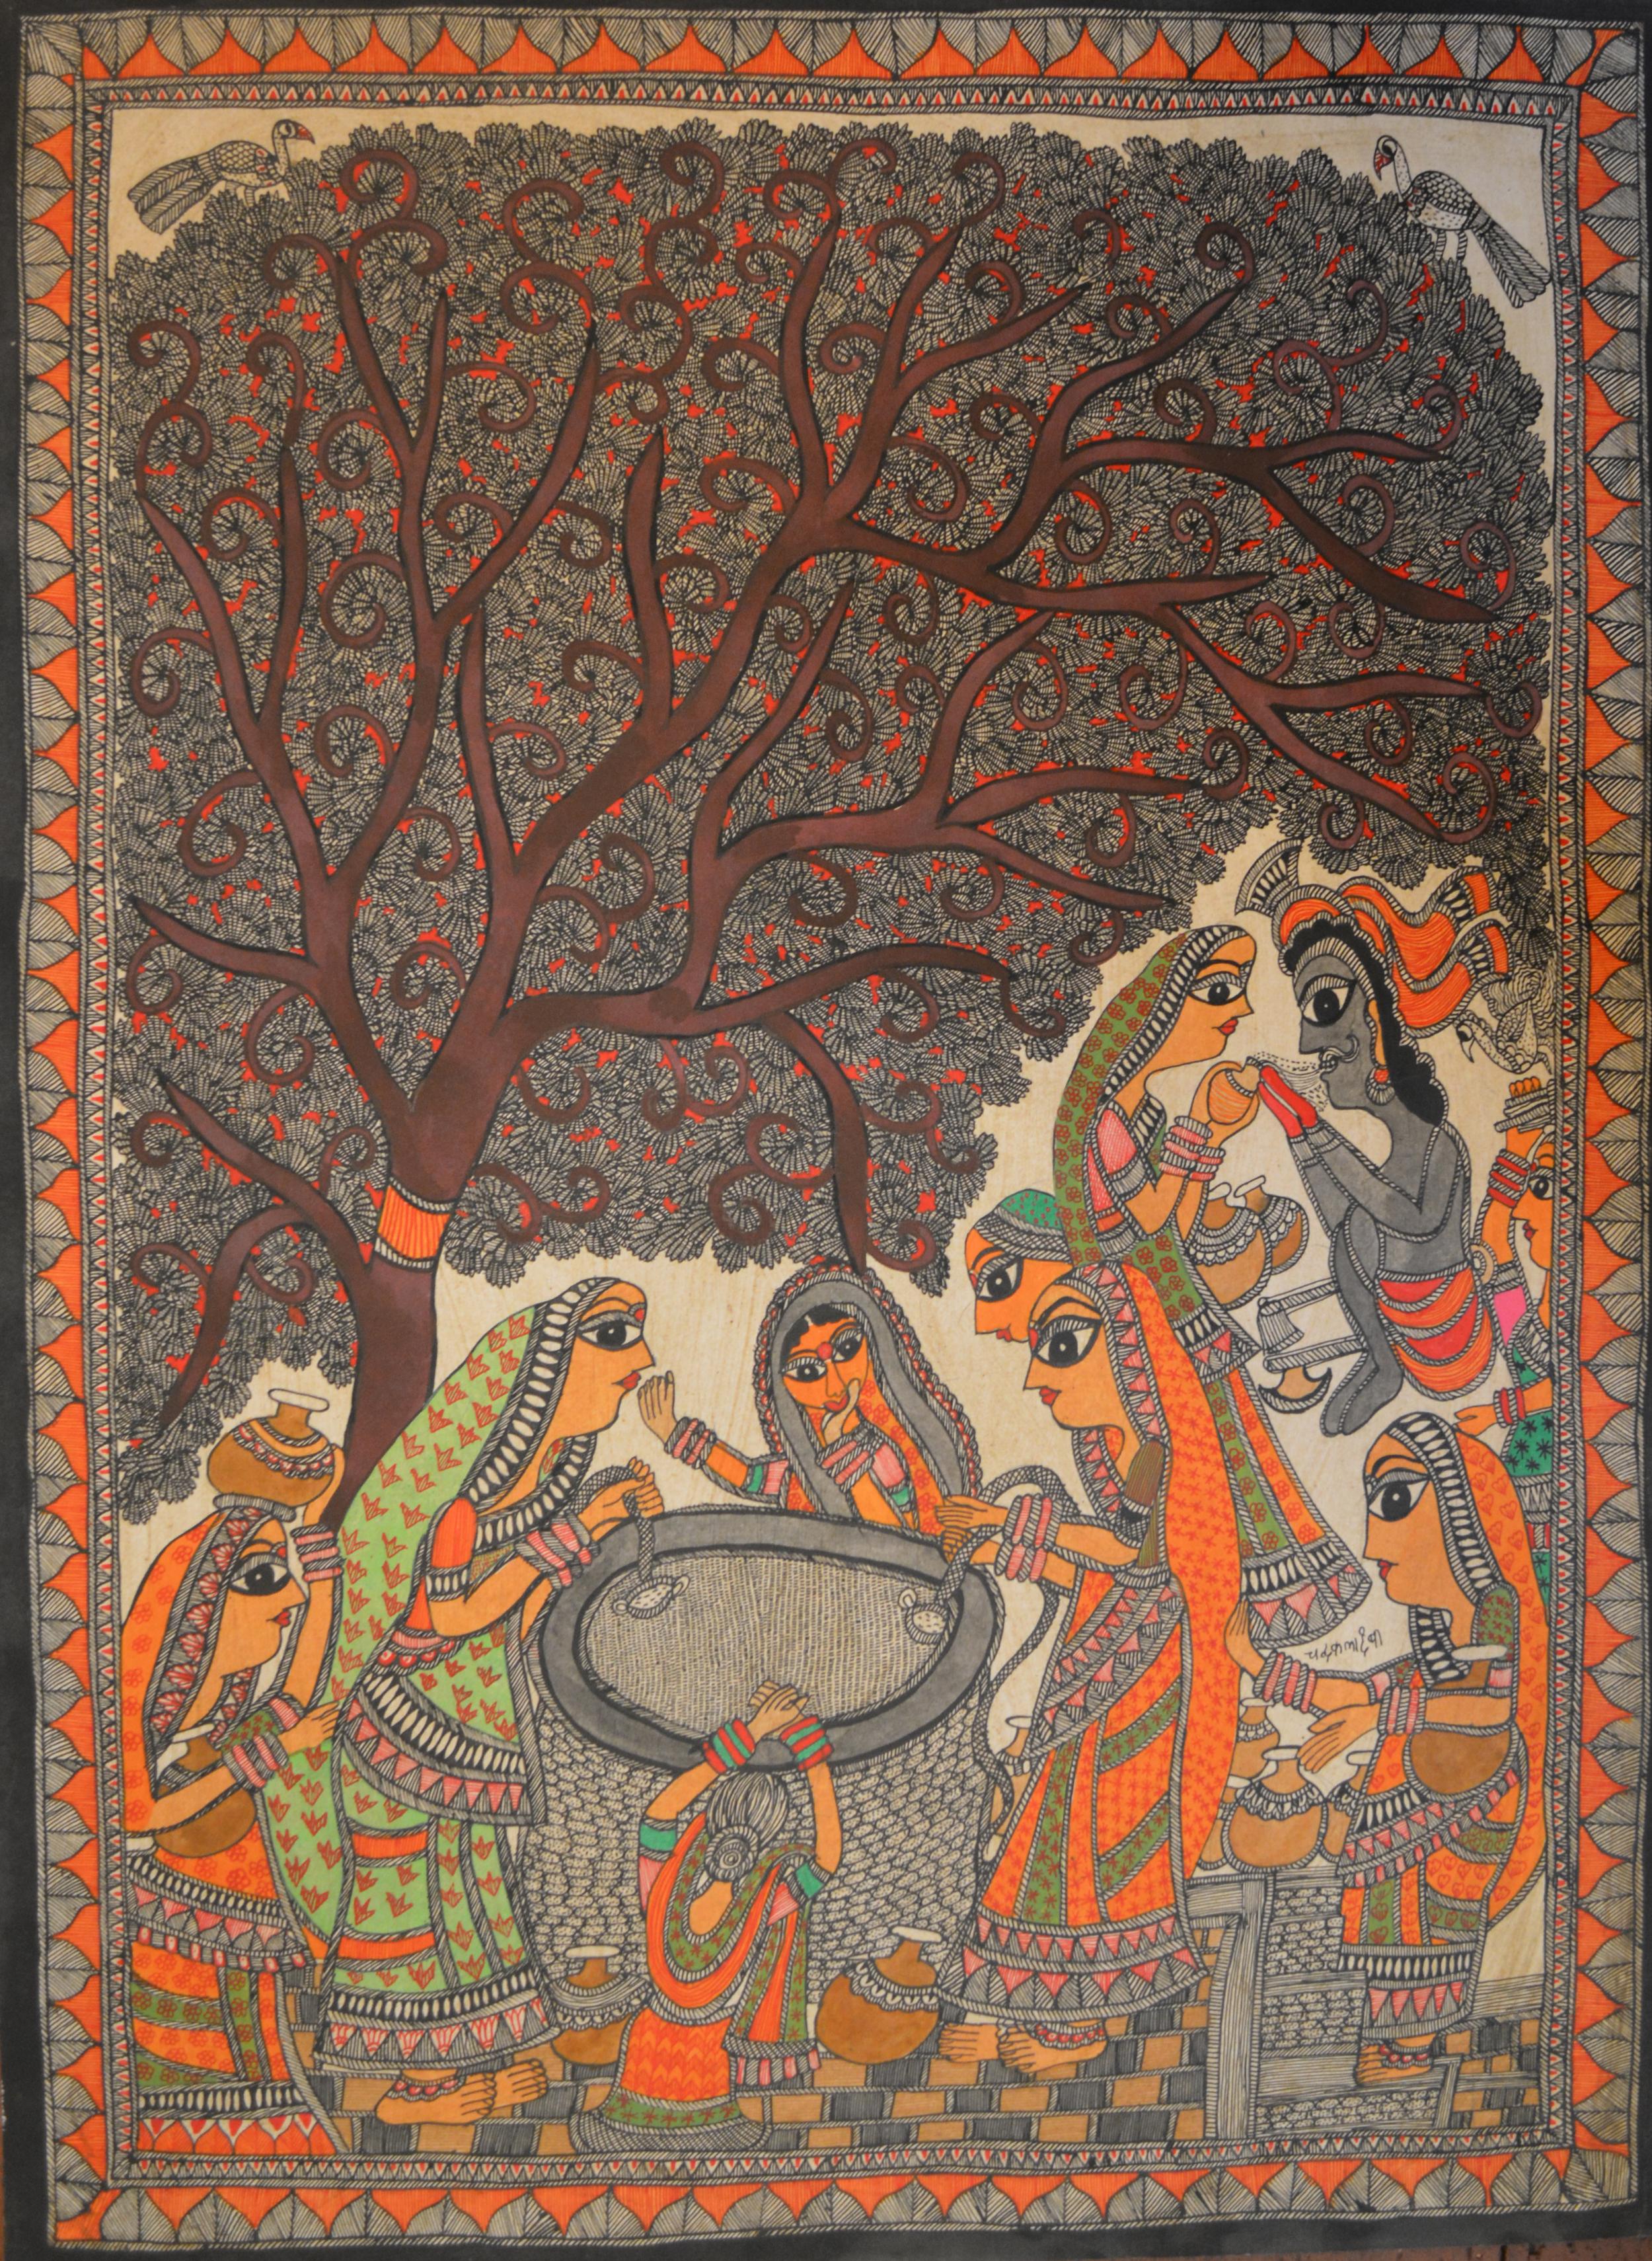 Chandrakala Devi, untitled, acrylic on paper, 76 x 56 cm, 2014.jpg